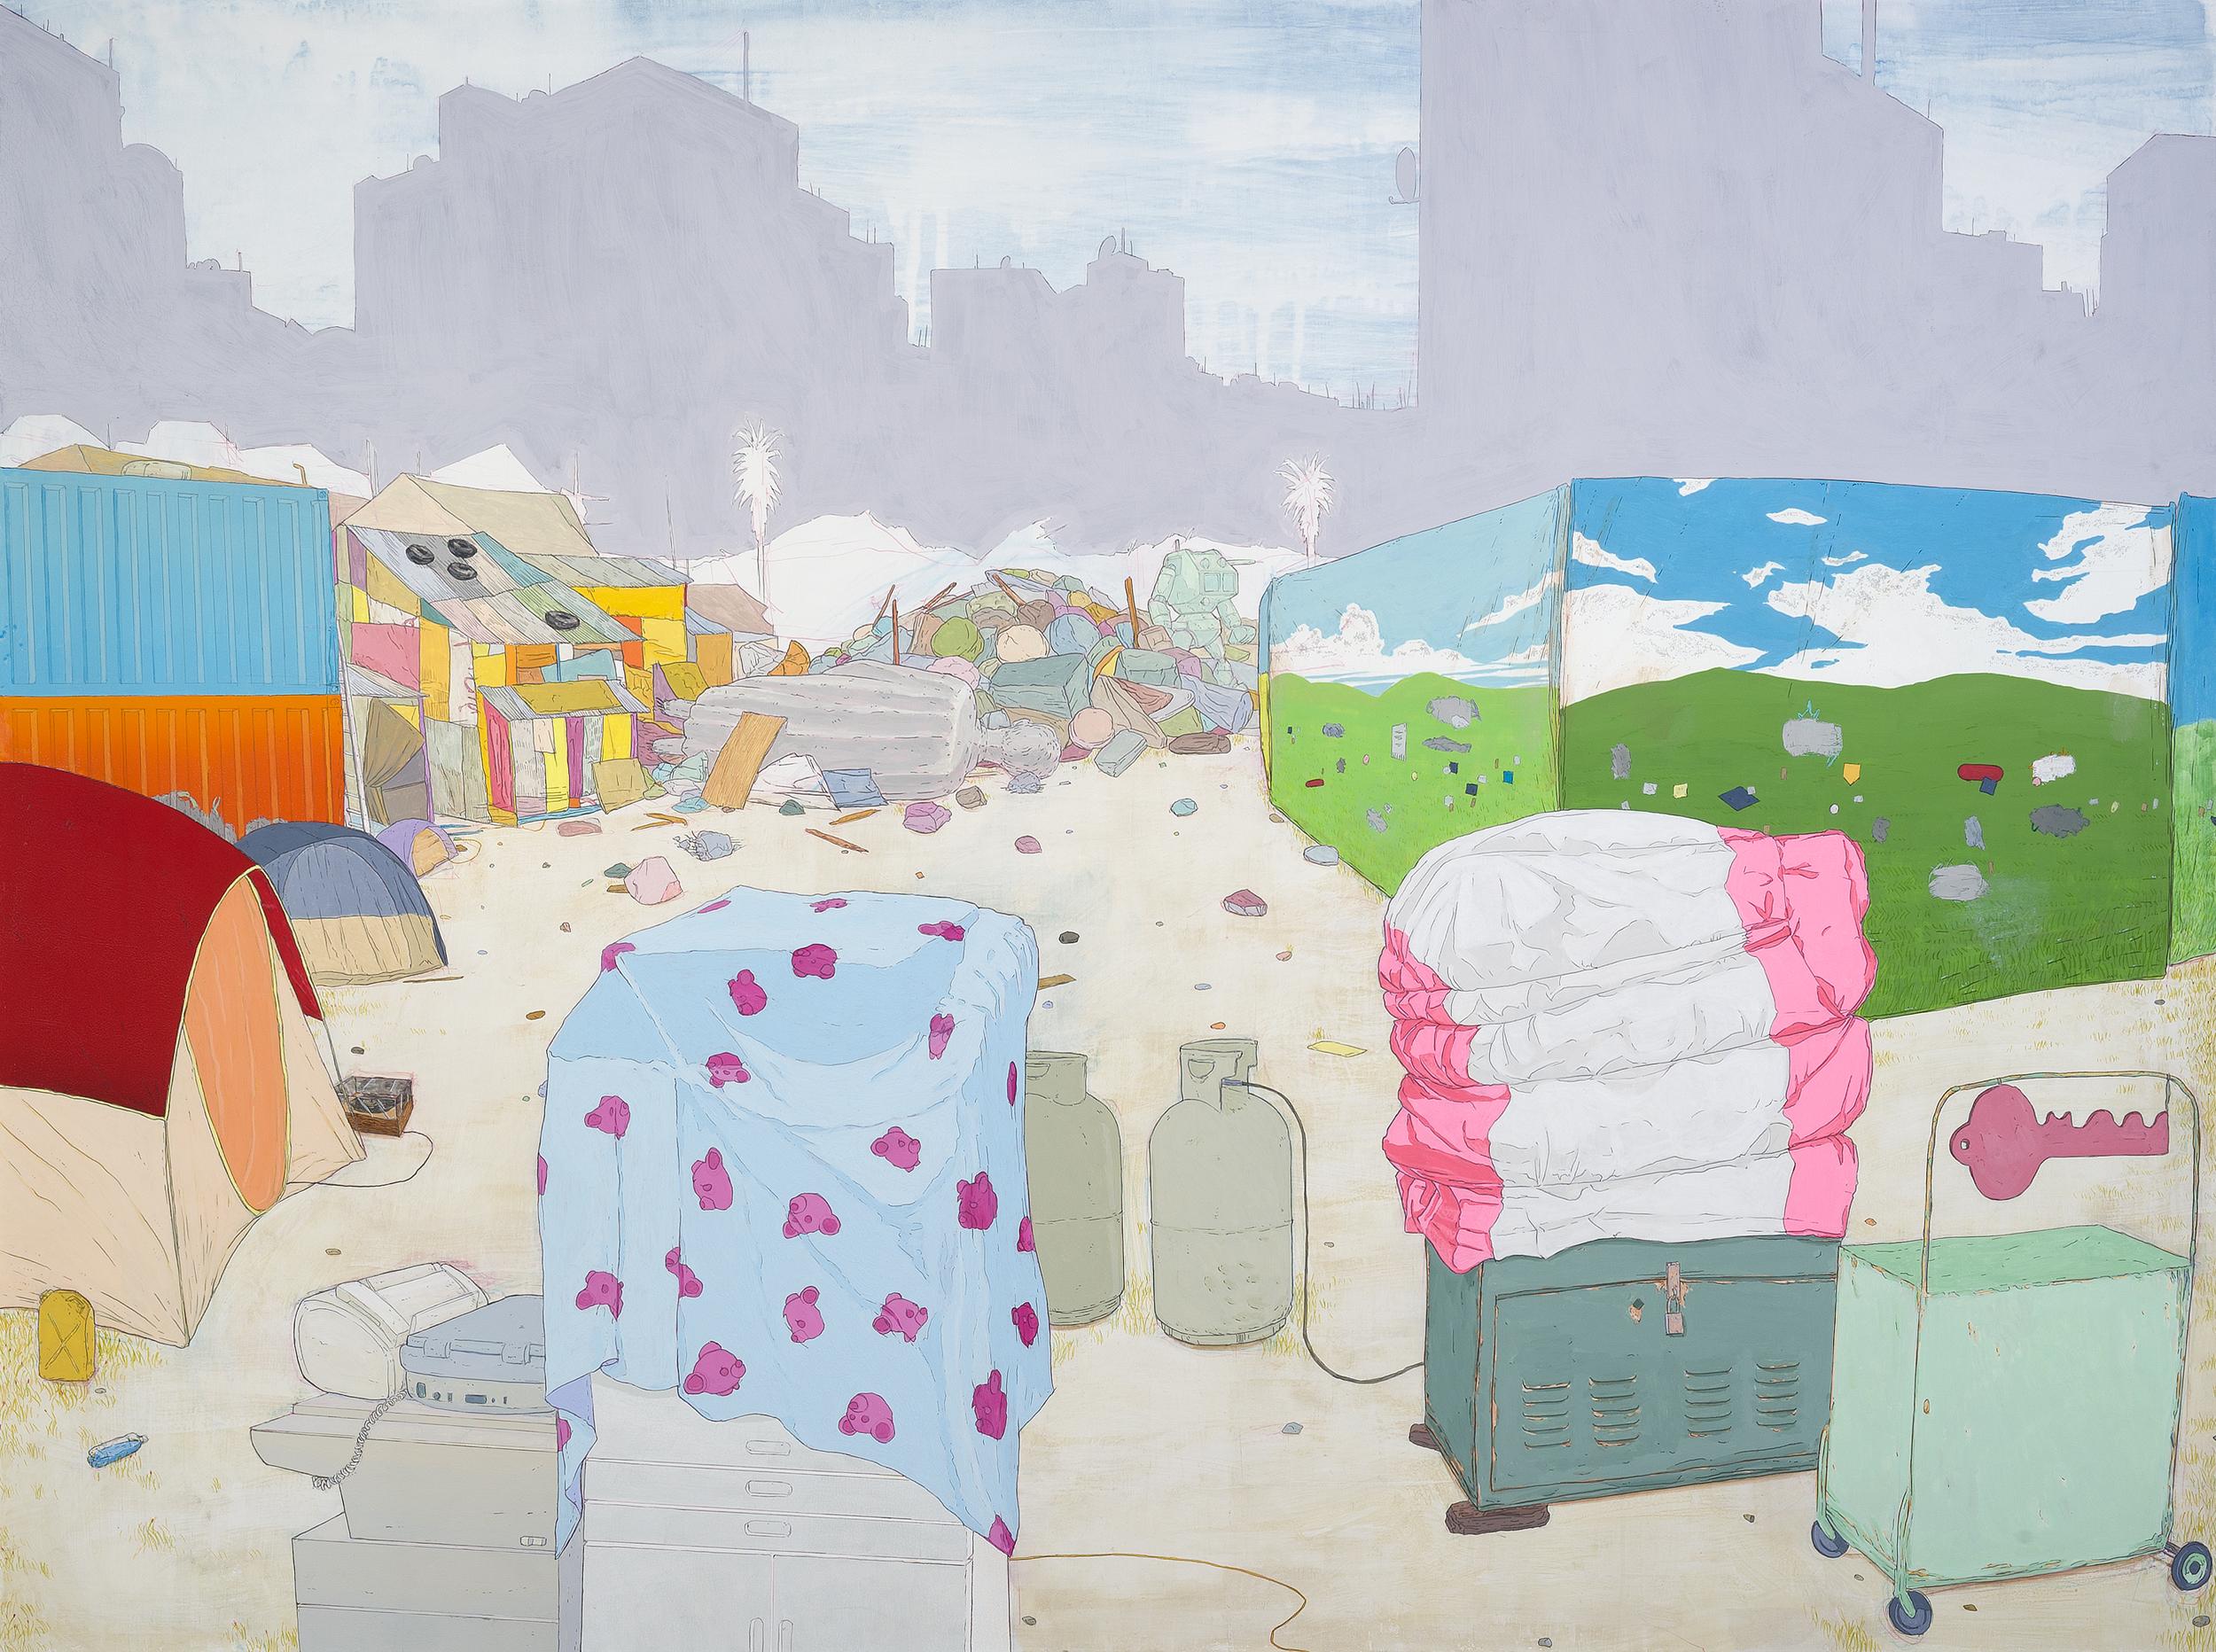 "Vertical Archipelago  Graphite, gouache, acrylic on canvas, 40x60"" 2013"